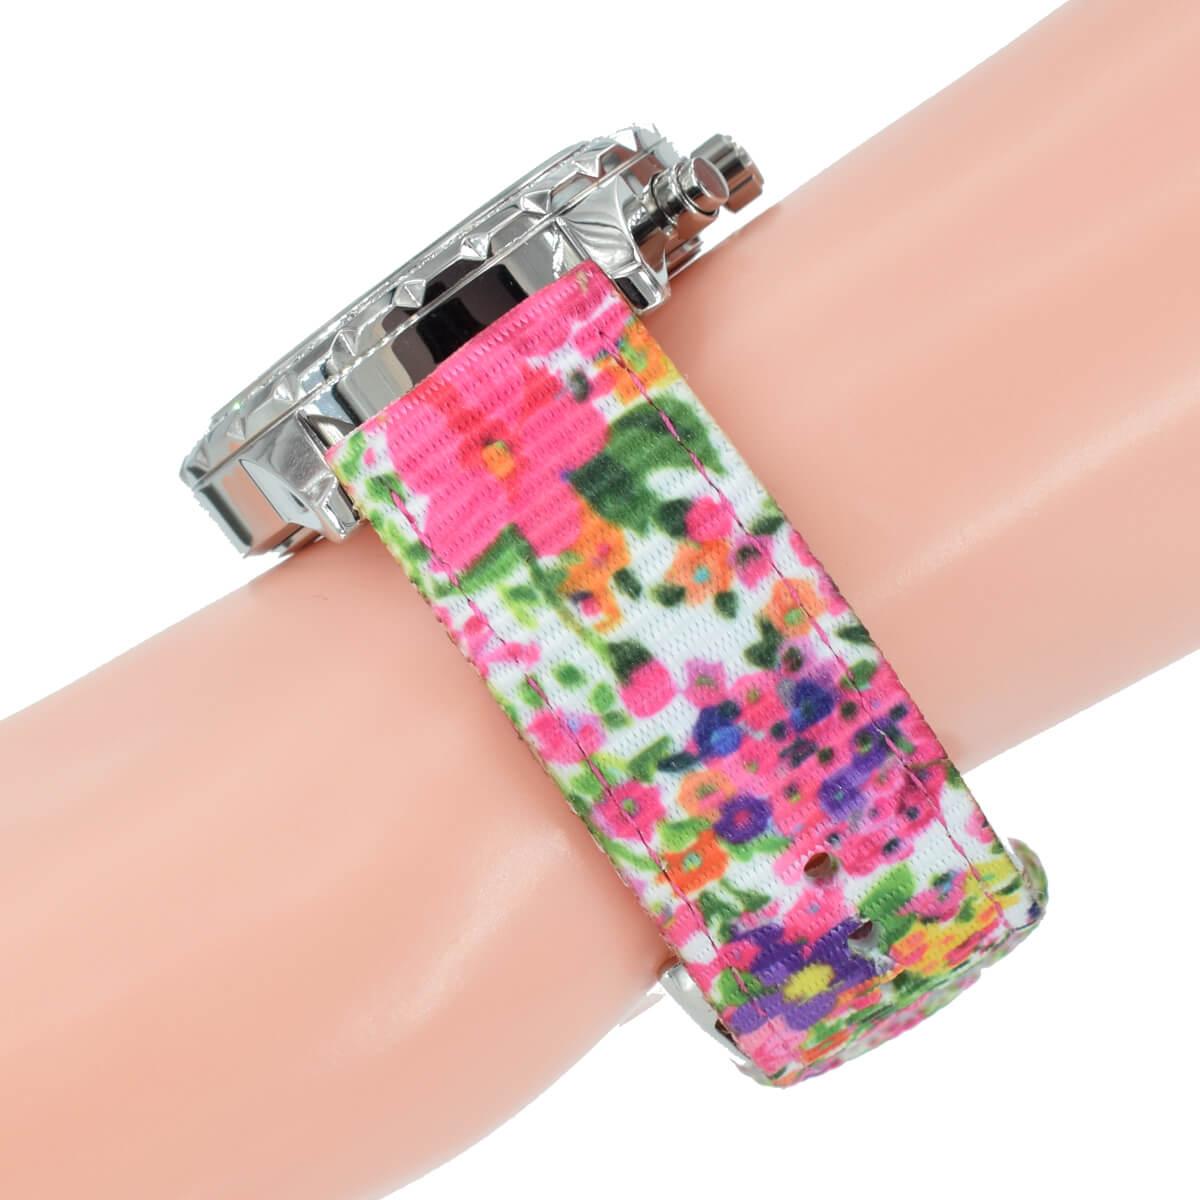 Blumen Muster Armband Guess Uhr W0903l1 Damen Bunt Melodie Nylon b7vIg6Yyfm